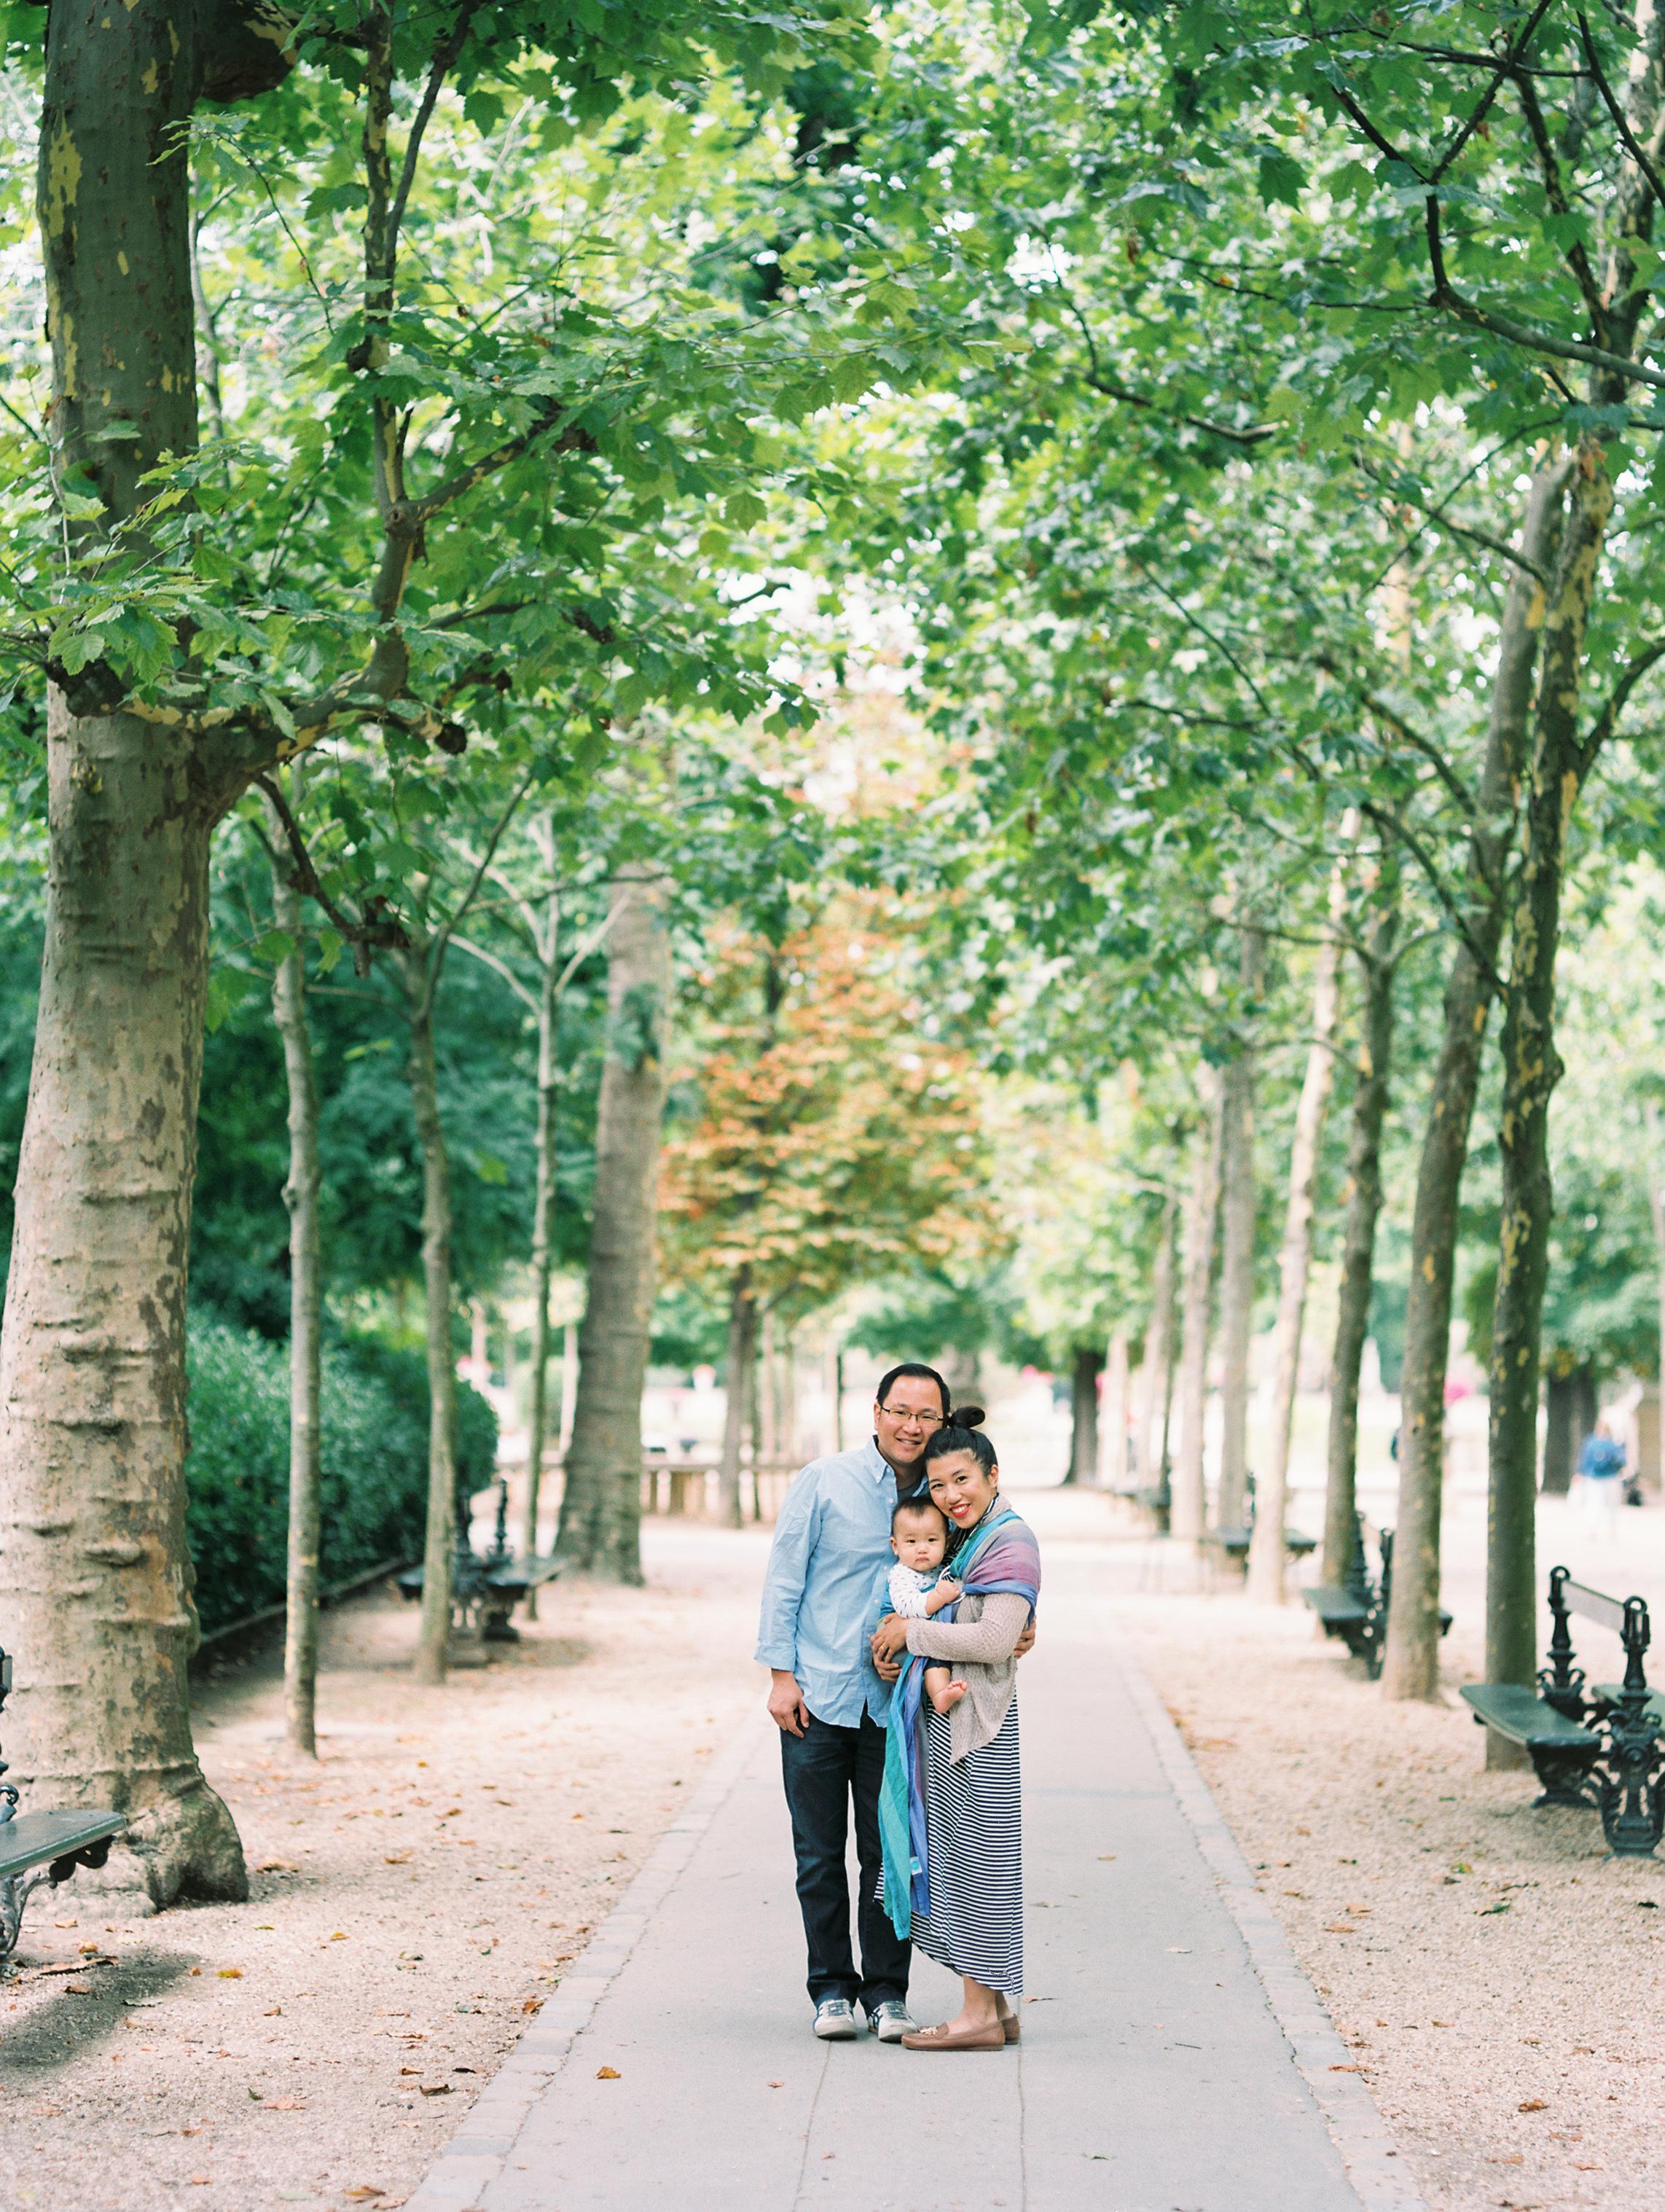 LiFamily-JardinduLuxembourg-1.jpg